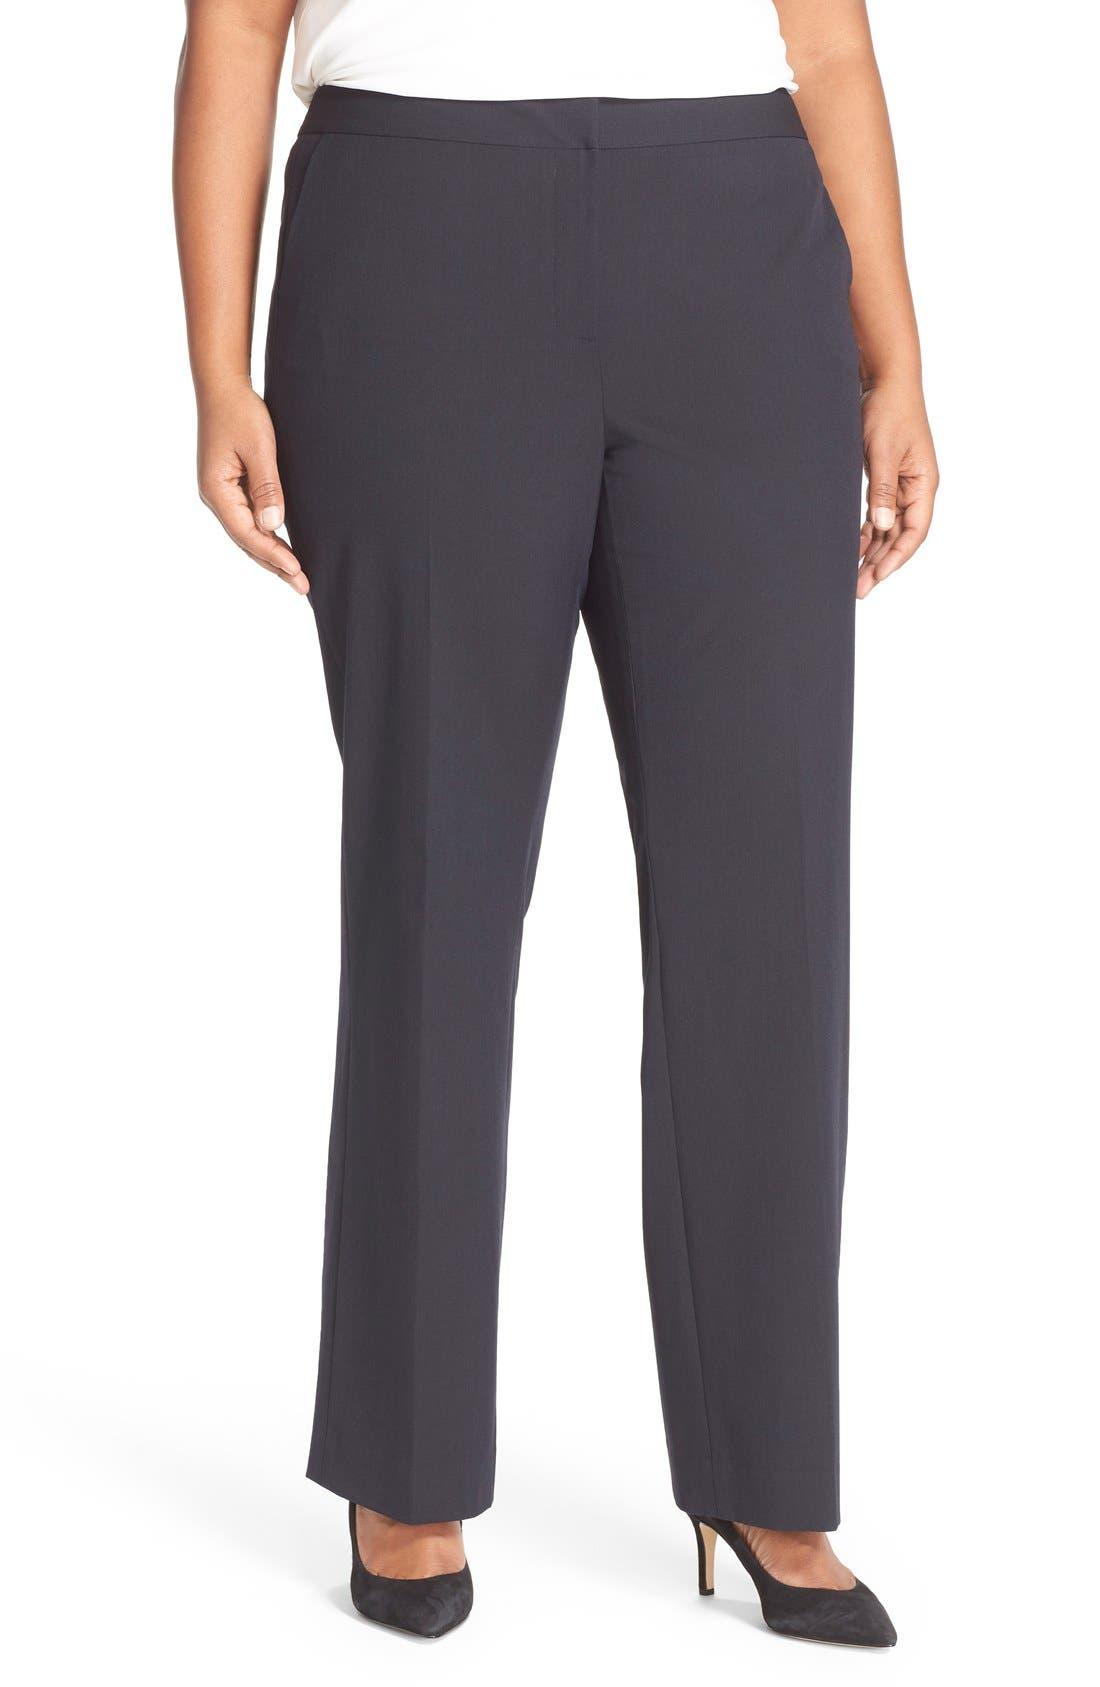 'Ela' Stretch Curvy Fit Wide Leg Suit Pants,                             Main thumbnail 1, color,                             Navy Midnight